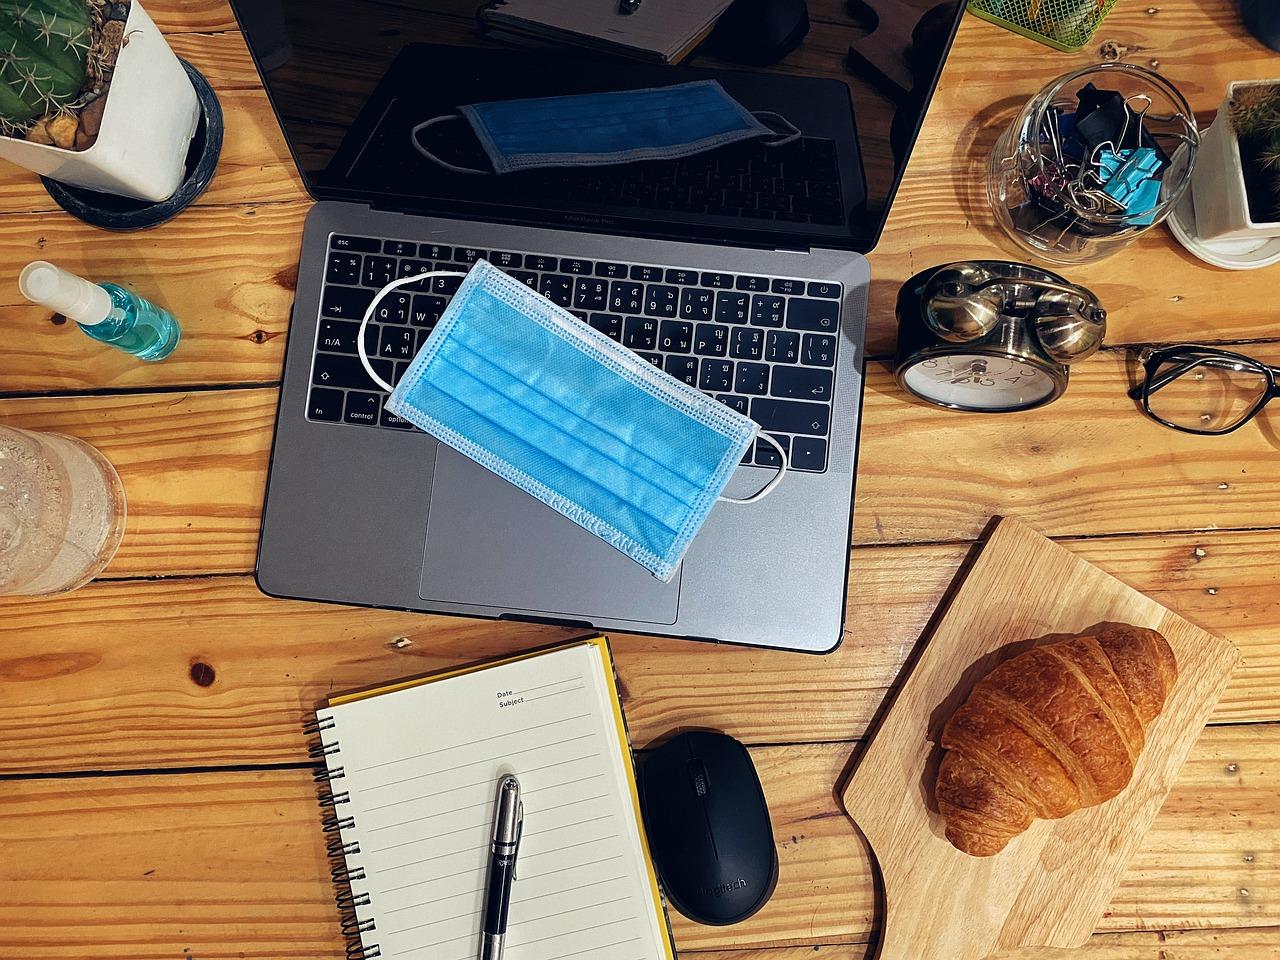 Smart working per sempre? Le vicende – contrastanti – di Apple, Facebook e Twitter